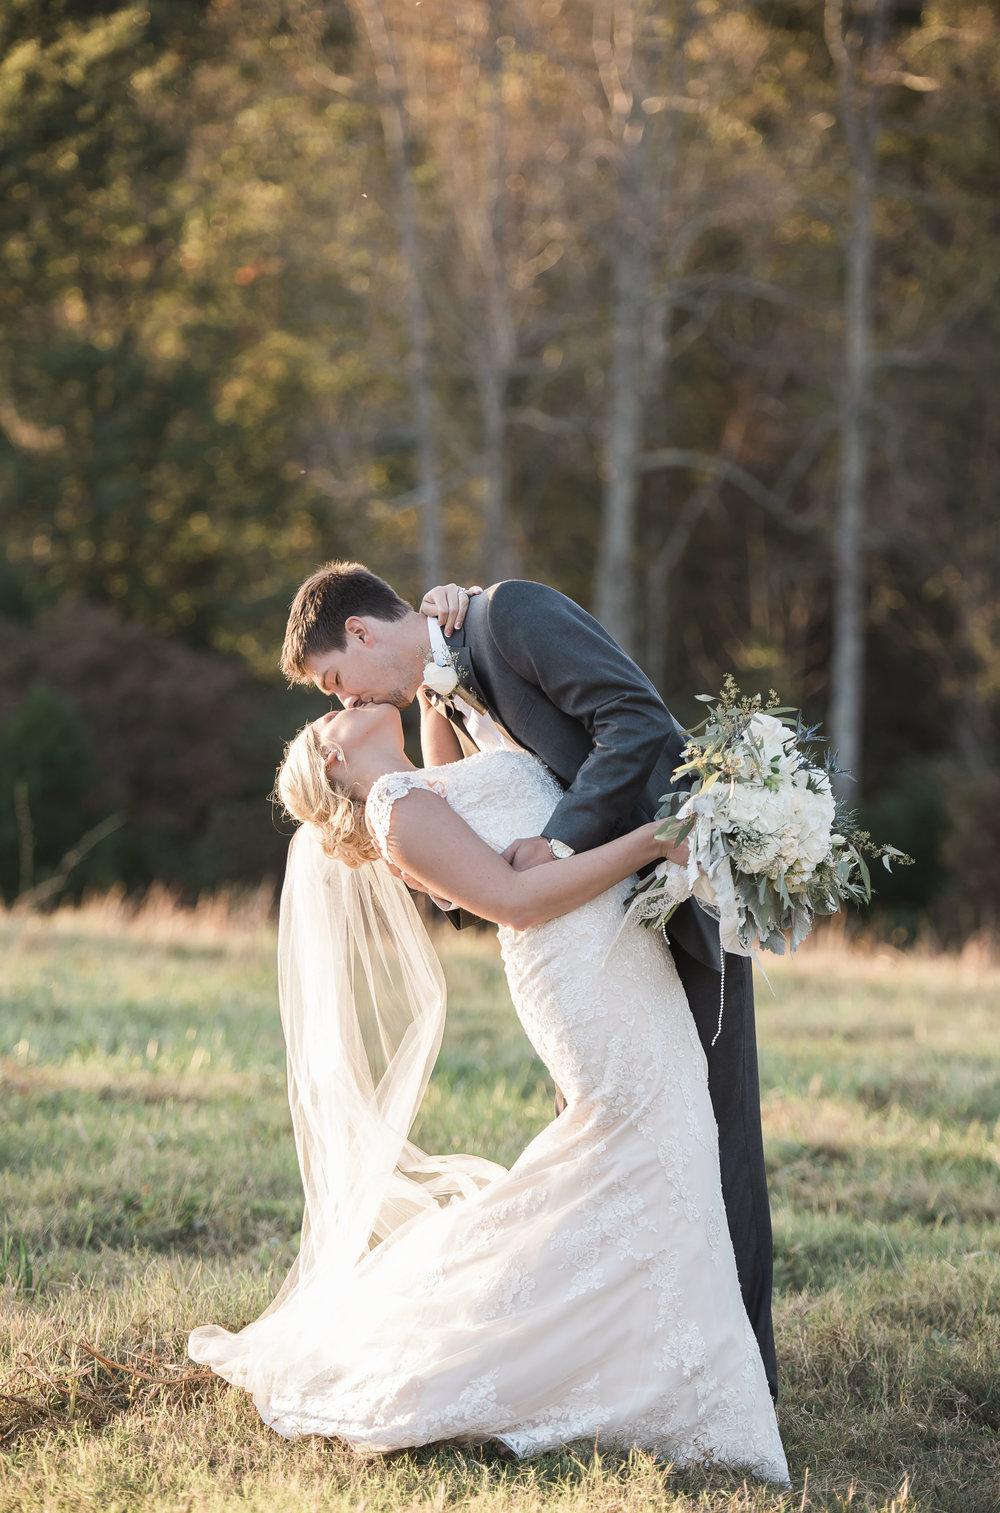 weddingbowlinggreenphotographercassieadkins_710.JPG